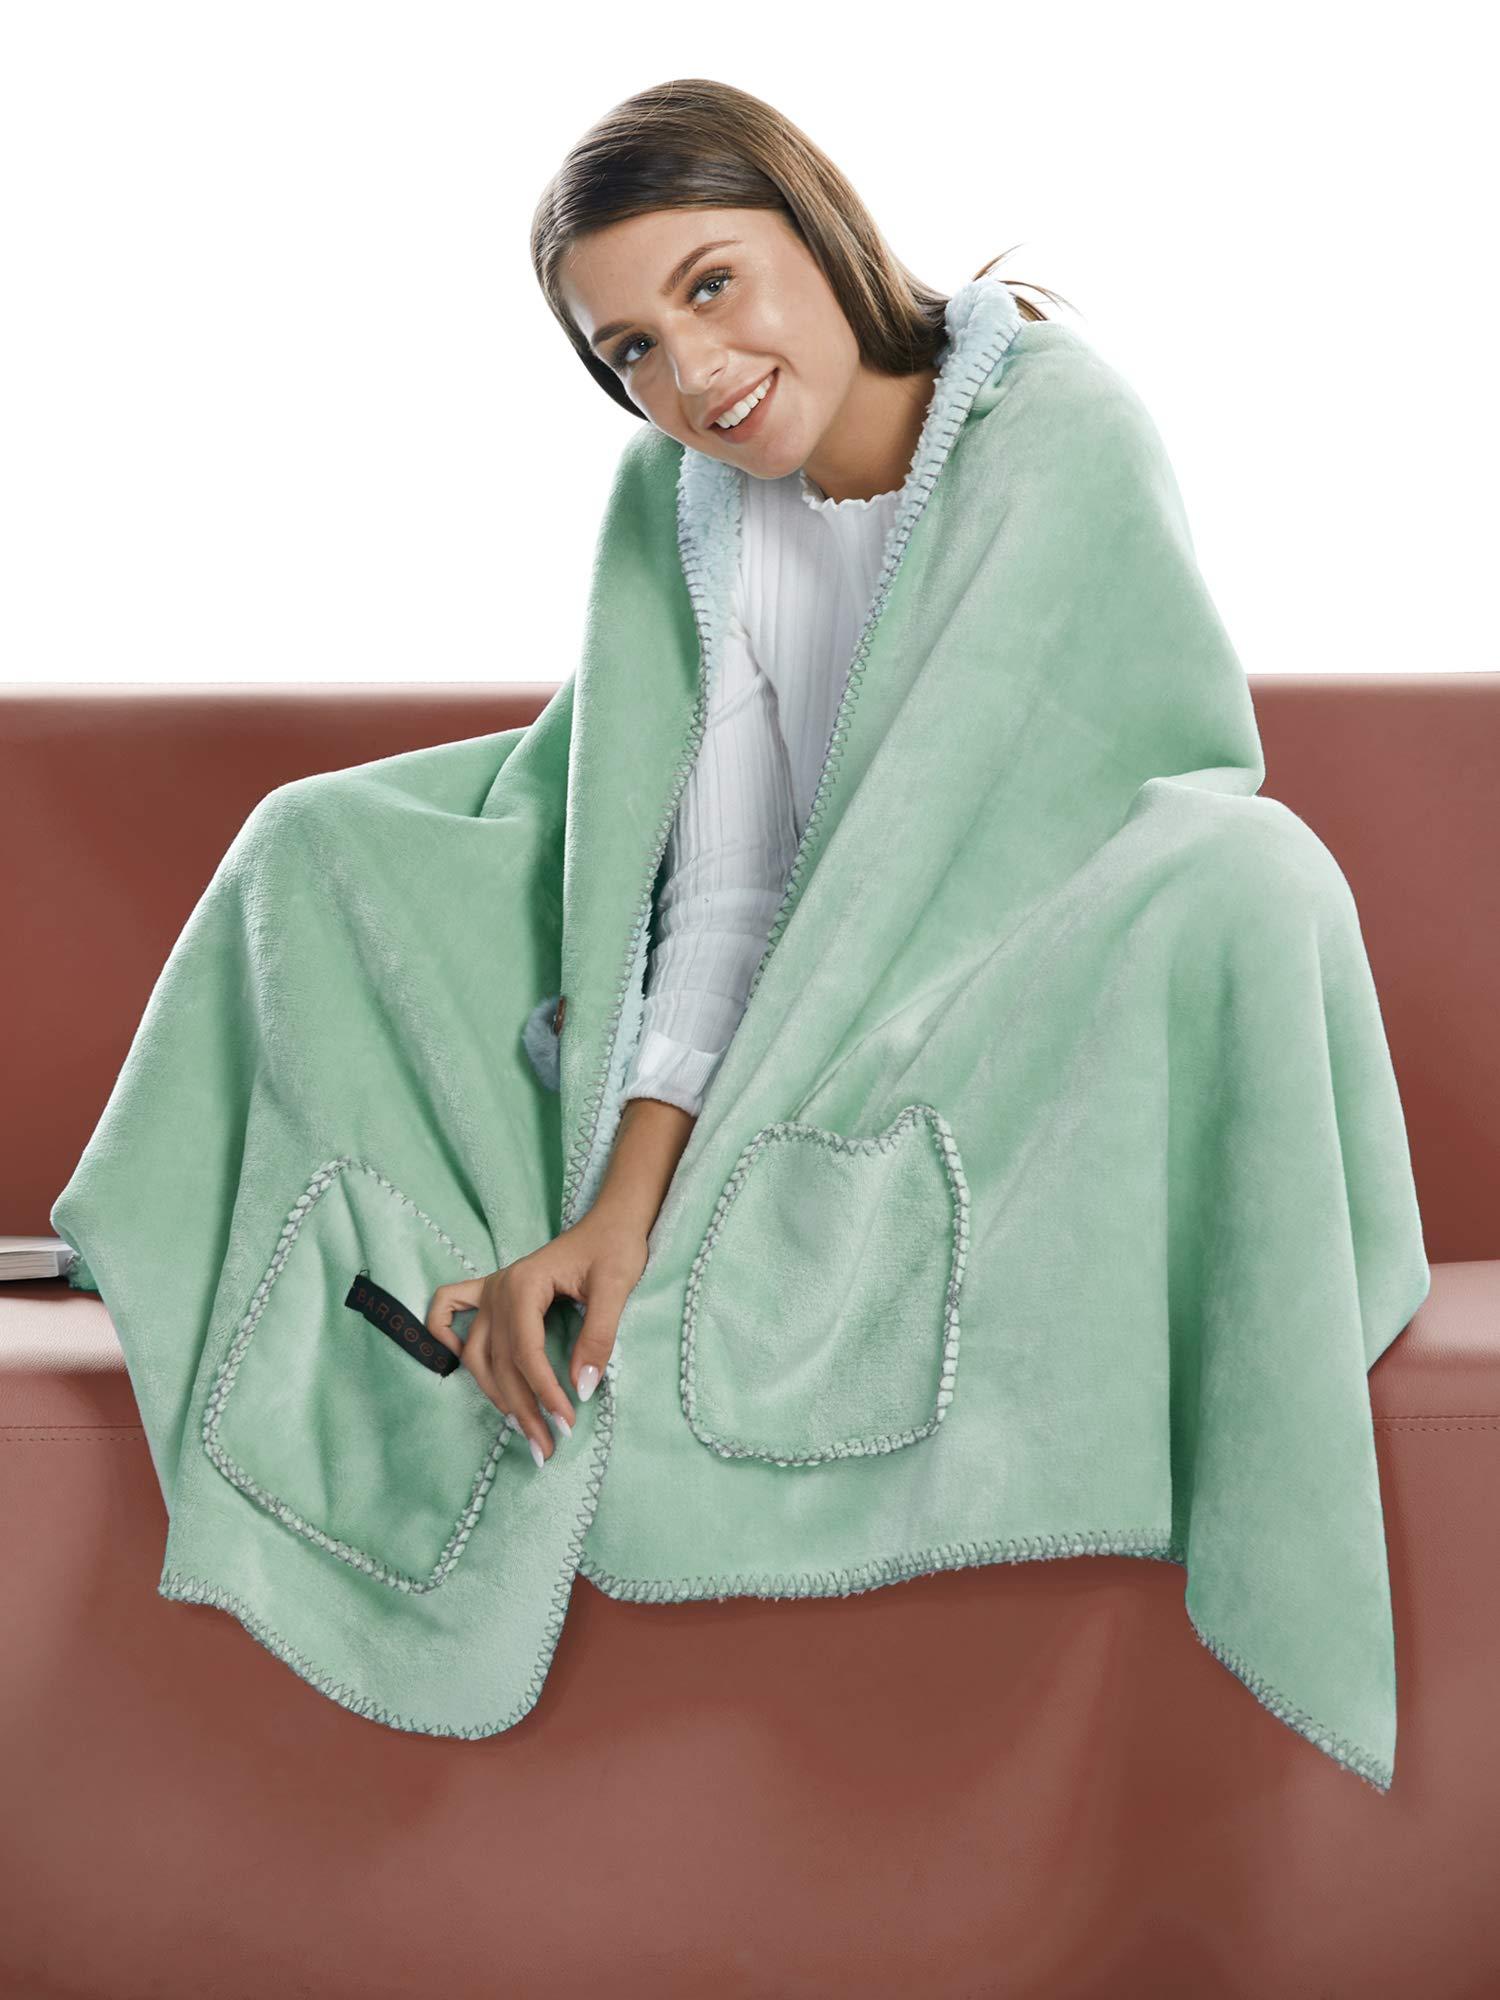 "BARGOOS Thick Wearable Blanket Poncho Warm Cozy Throw Wrap Shawls with Pockets Fleece Flannel Sherpa Plush Green Medium 67"" x 24"""